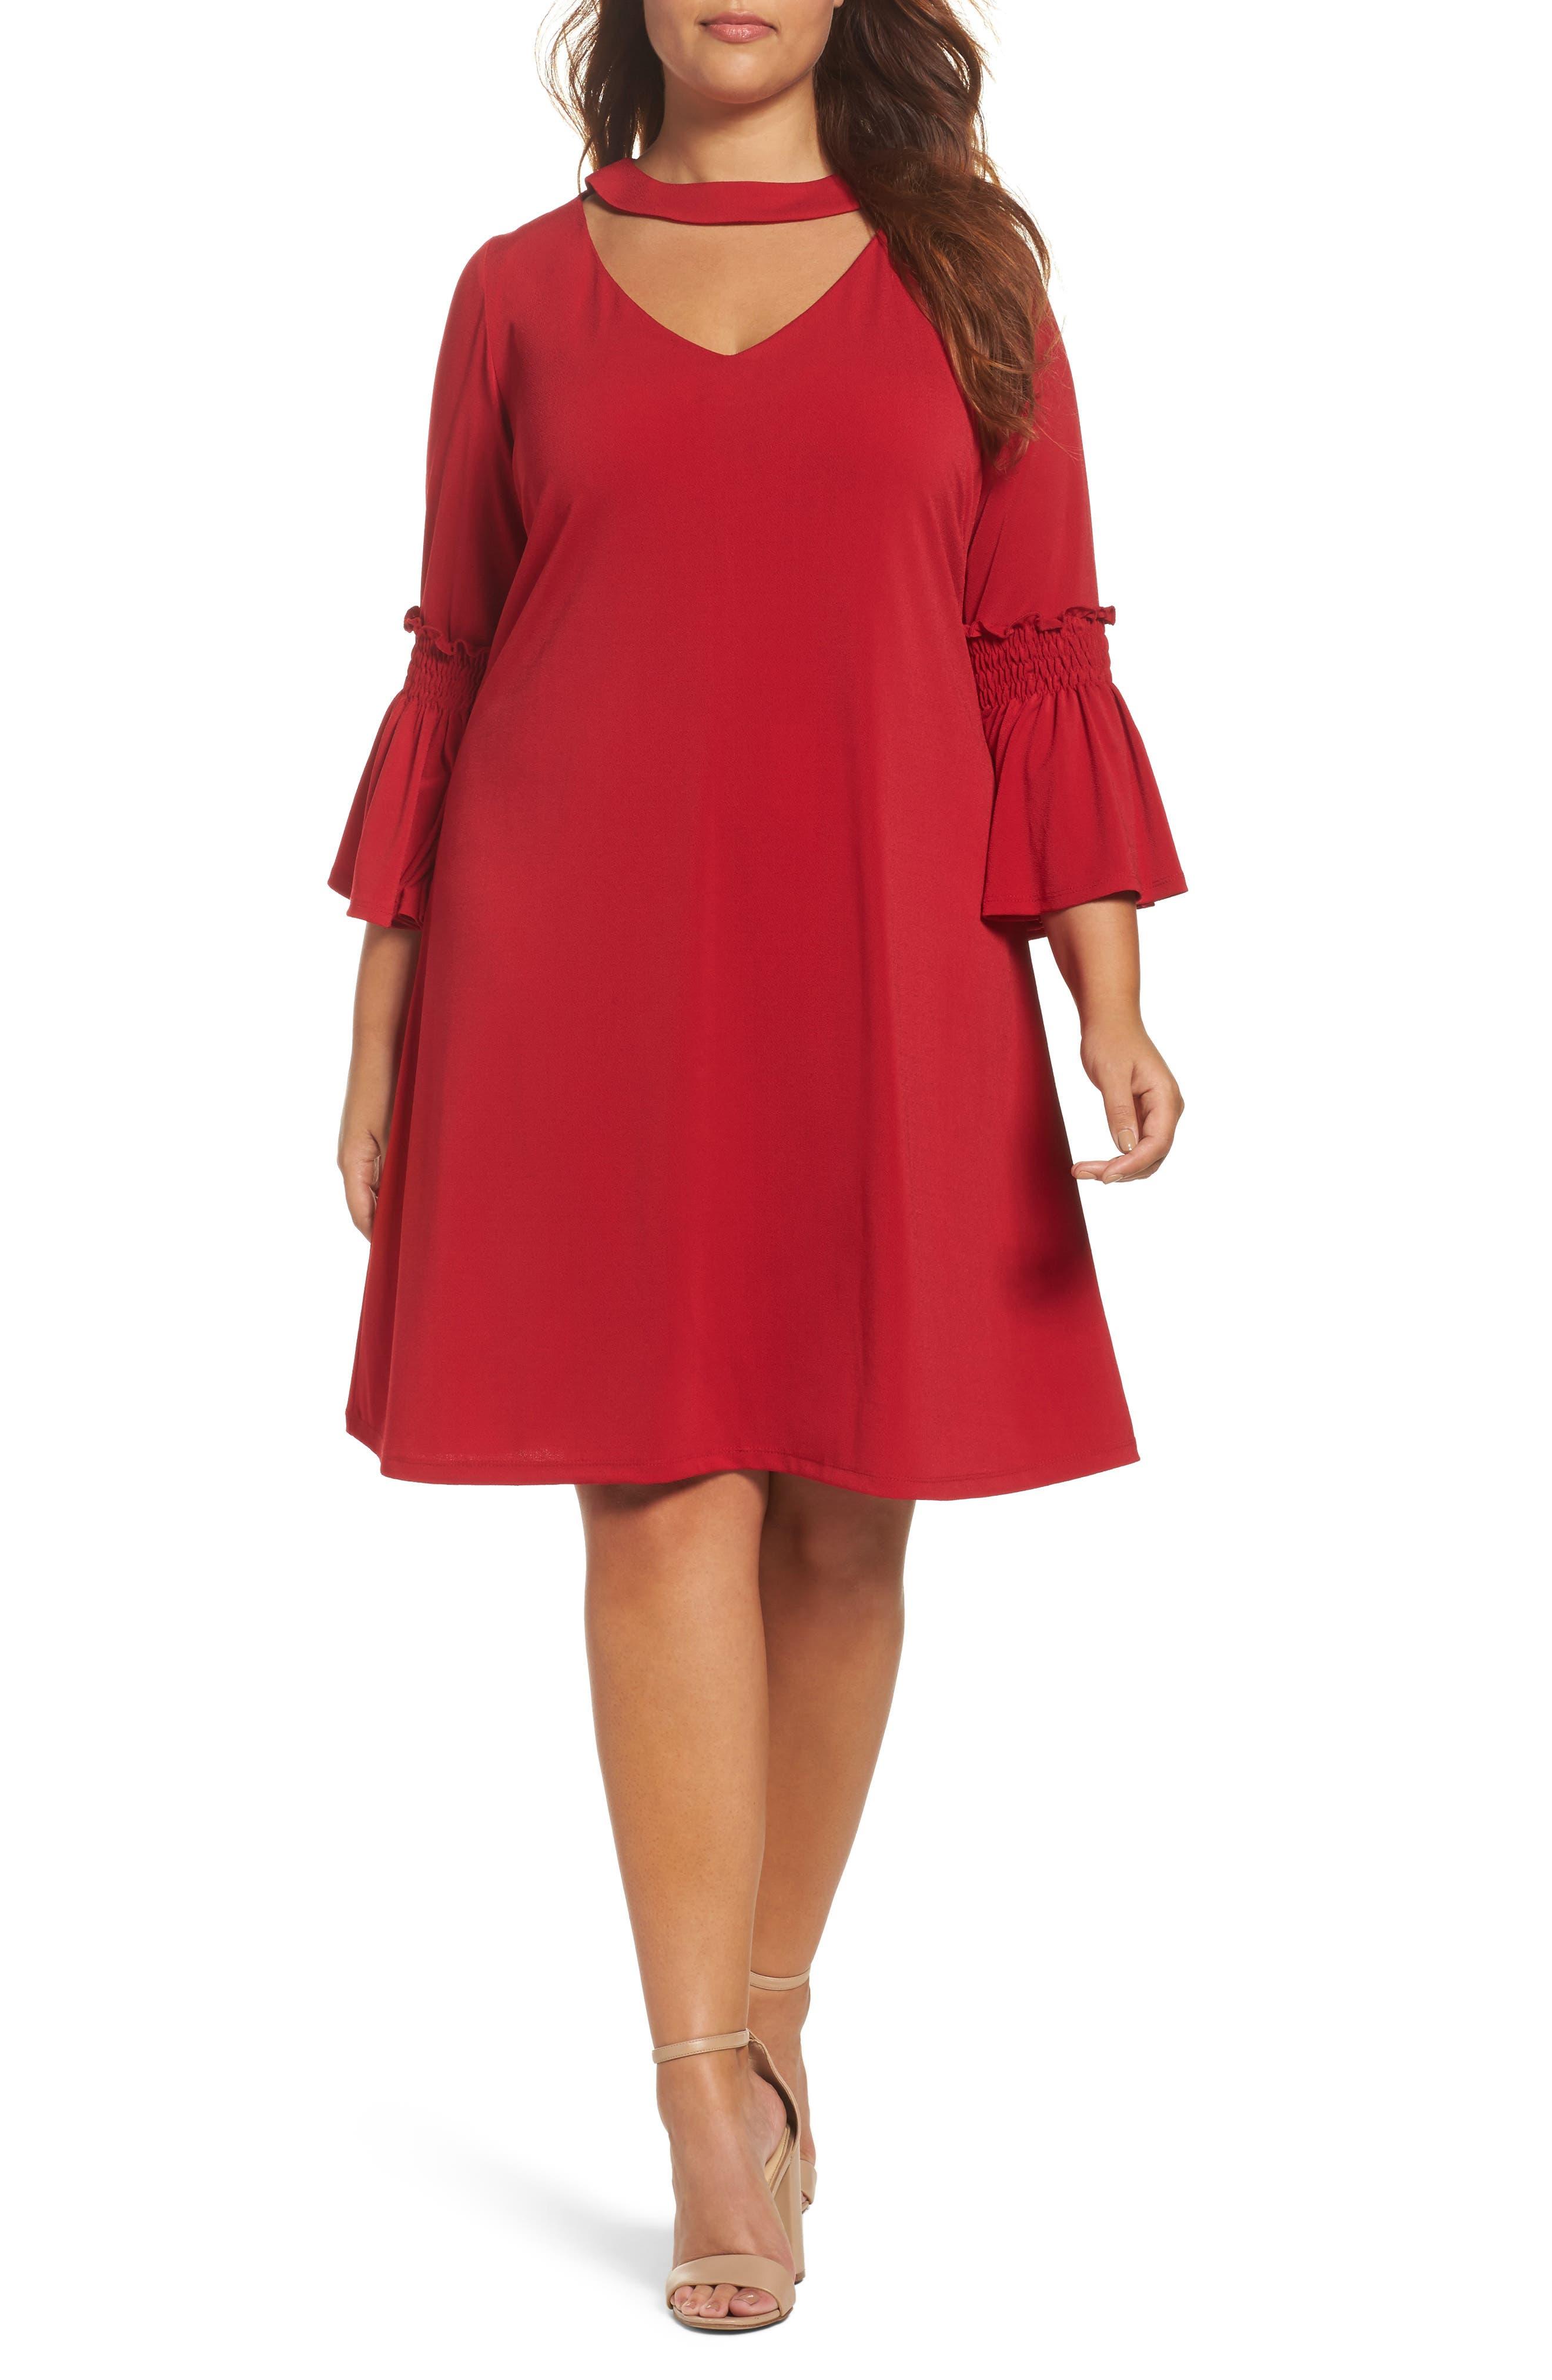 Gabby Skye Bell Sleeve A-Line Choker Dress (Plus Size)